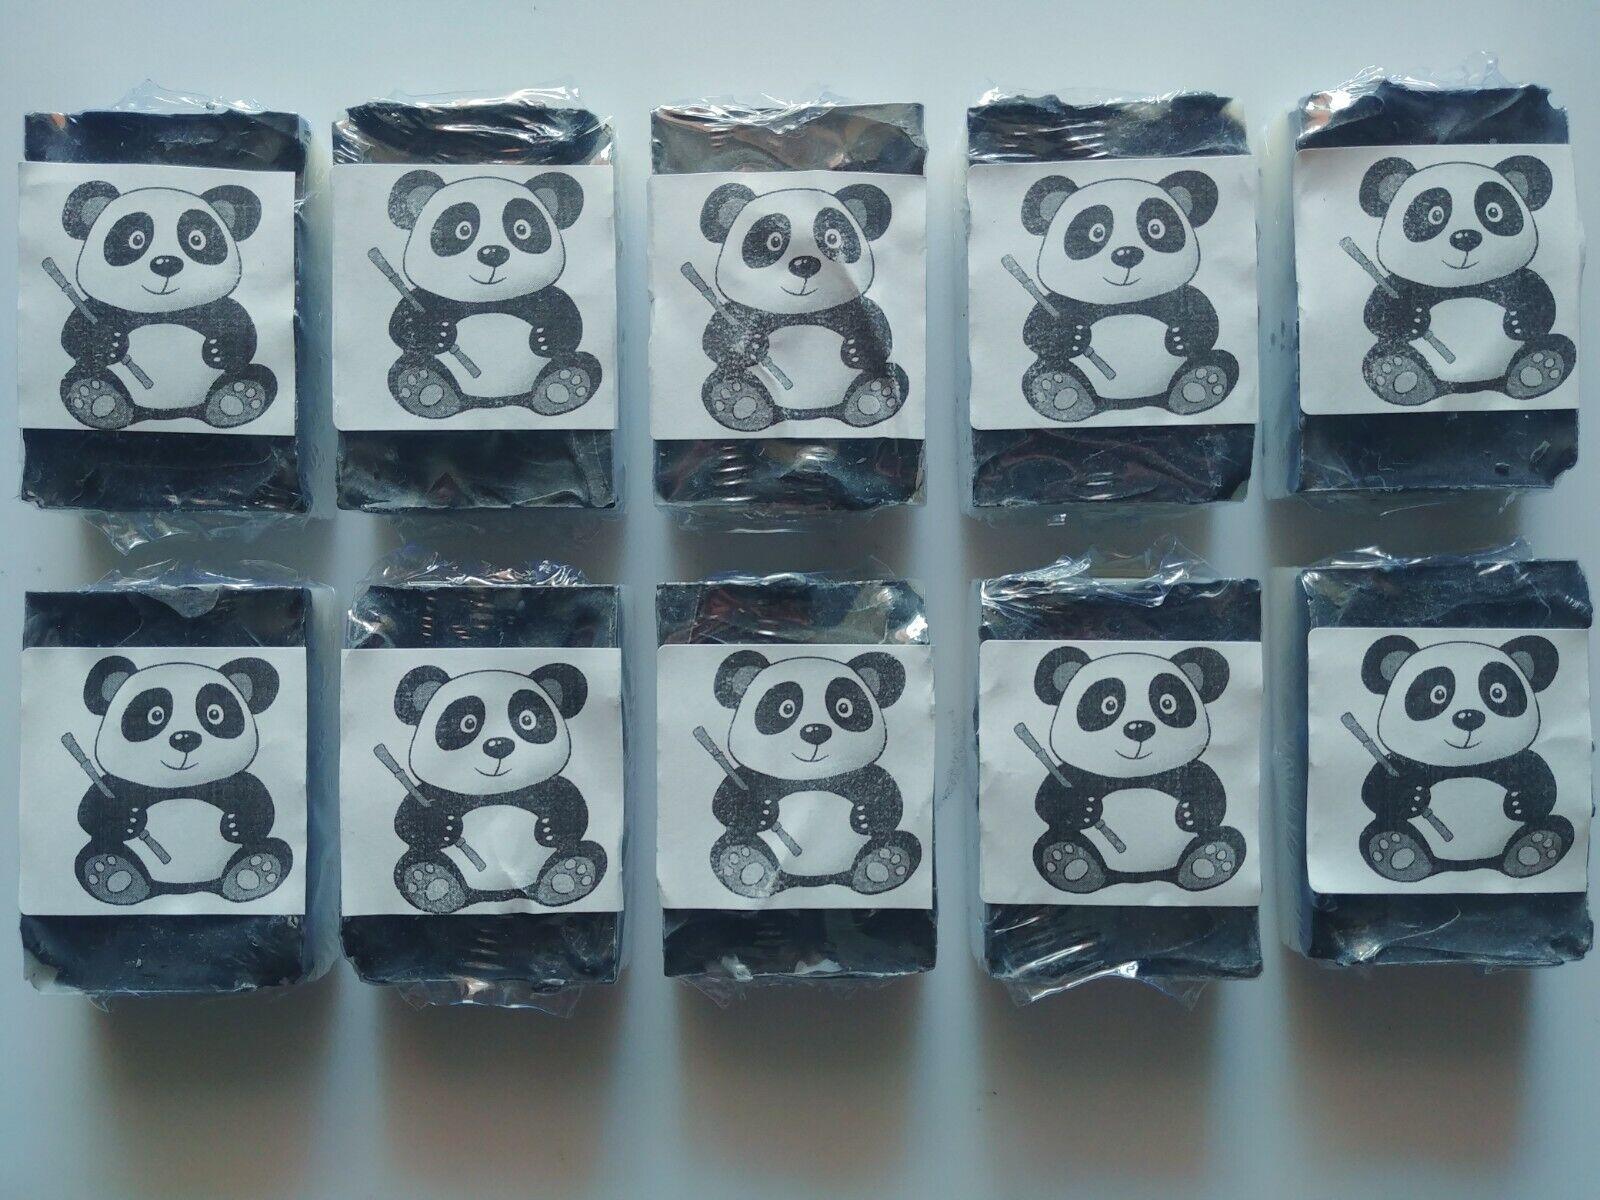 10 x Panda Bar Soap - Coconut Oil & Charcoal Unscented Homem